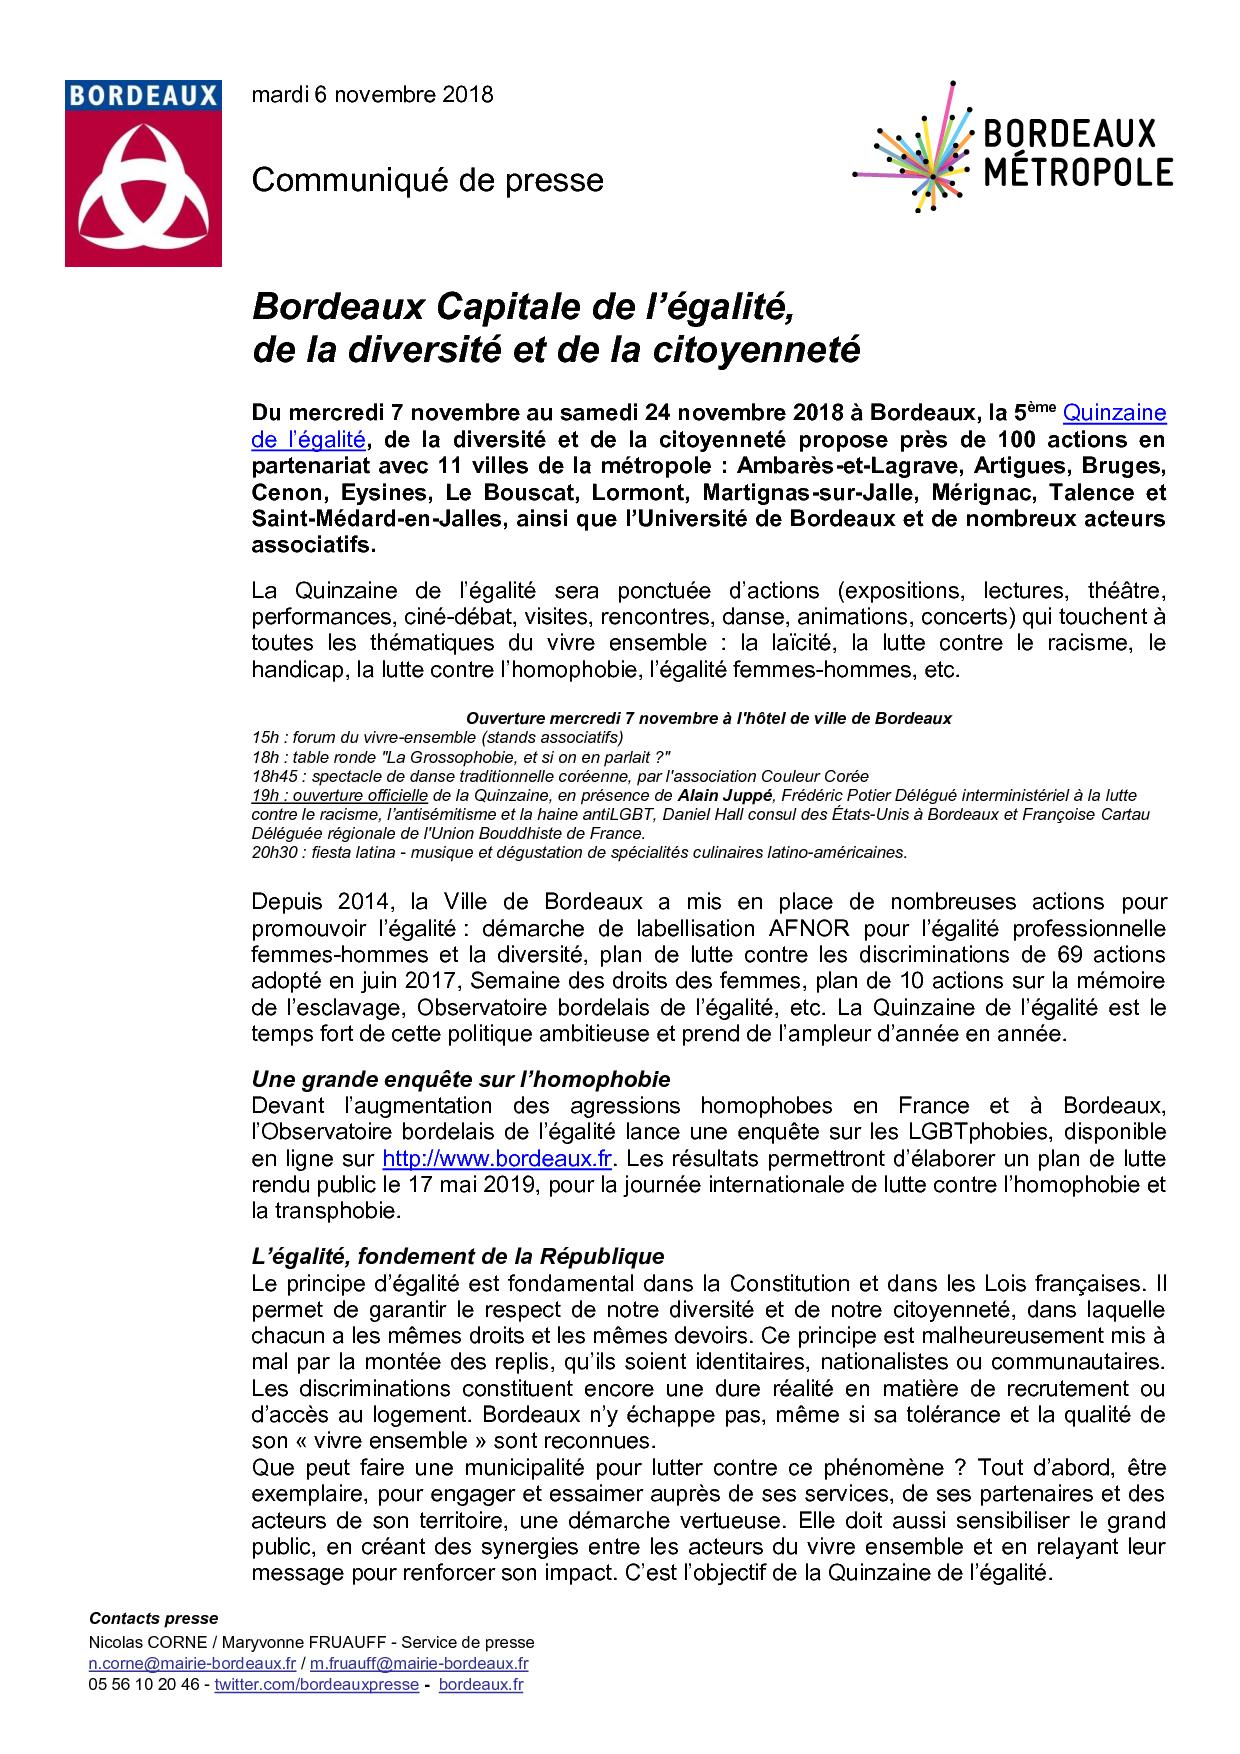 cp-quinzaineegalitebordeaux11-2018